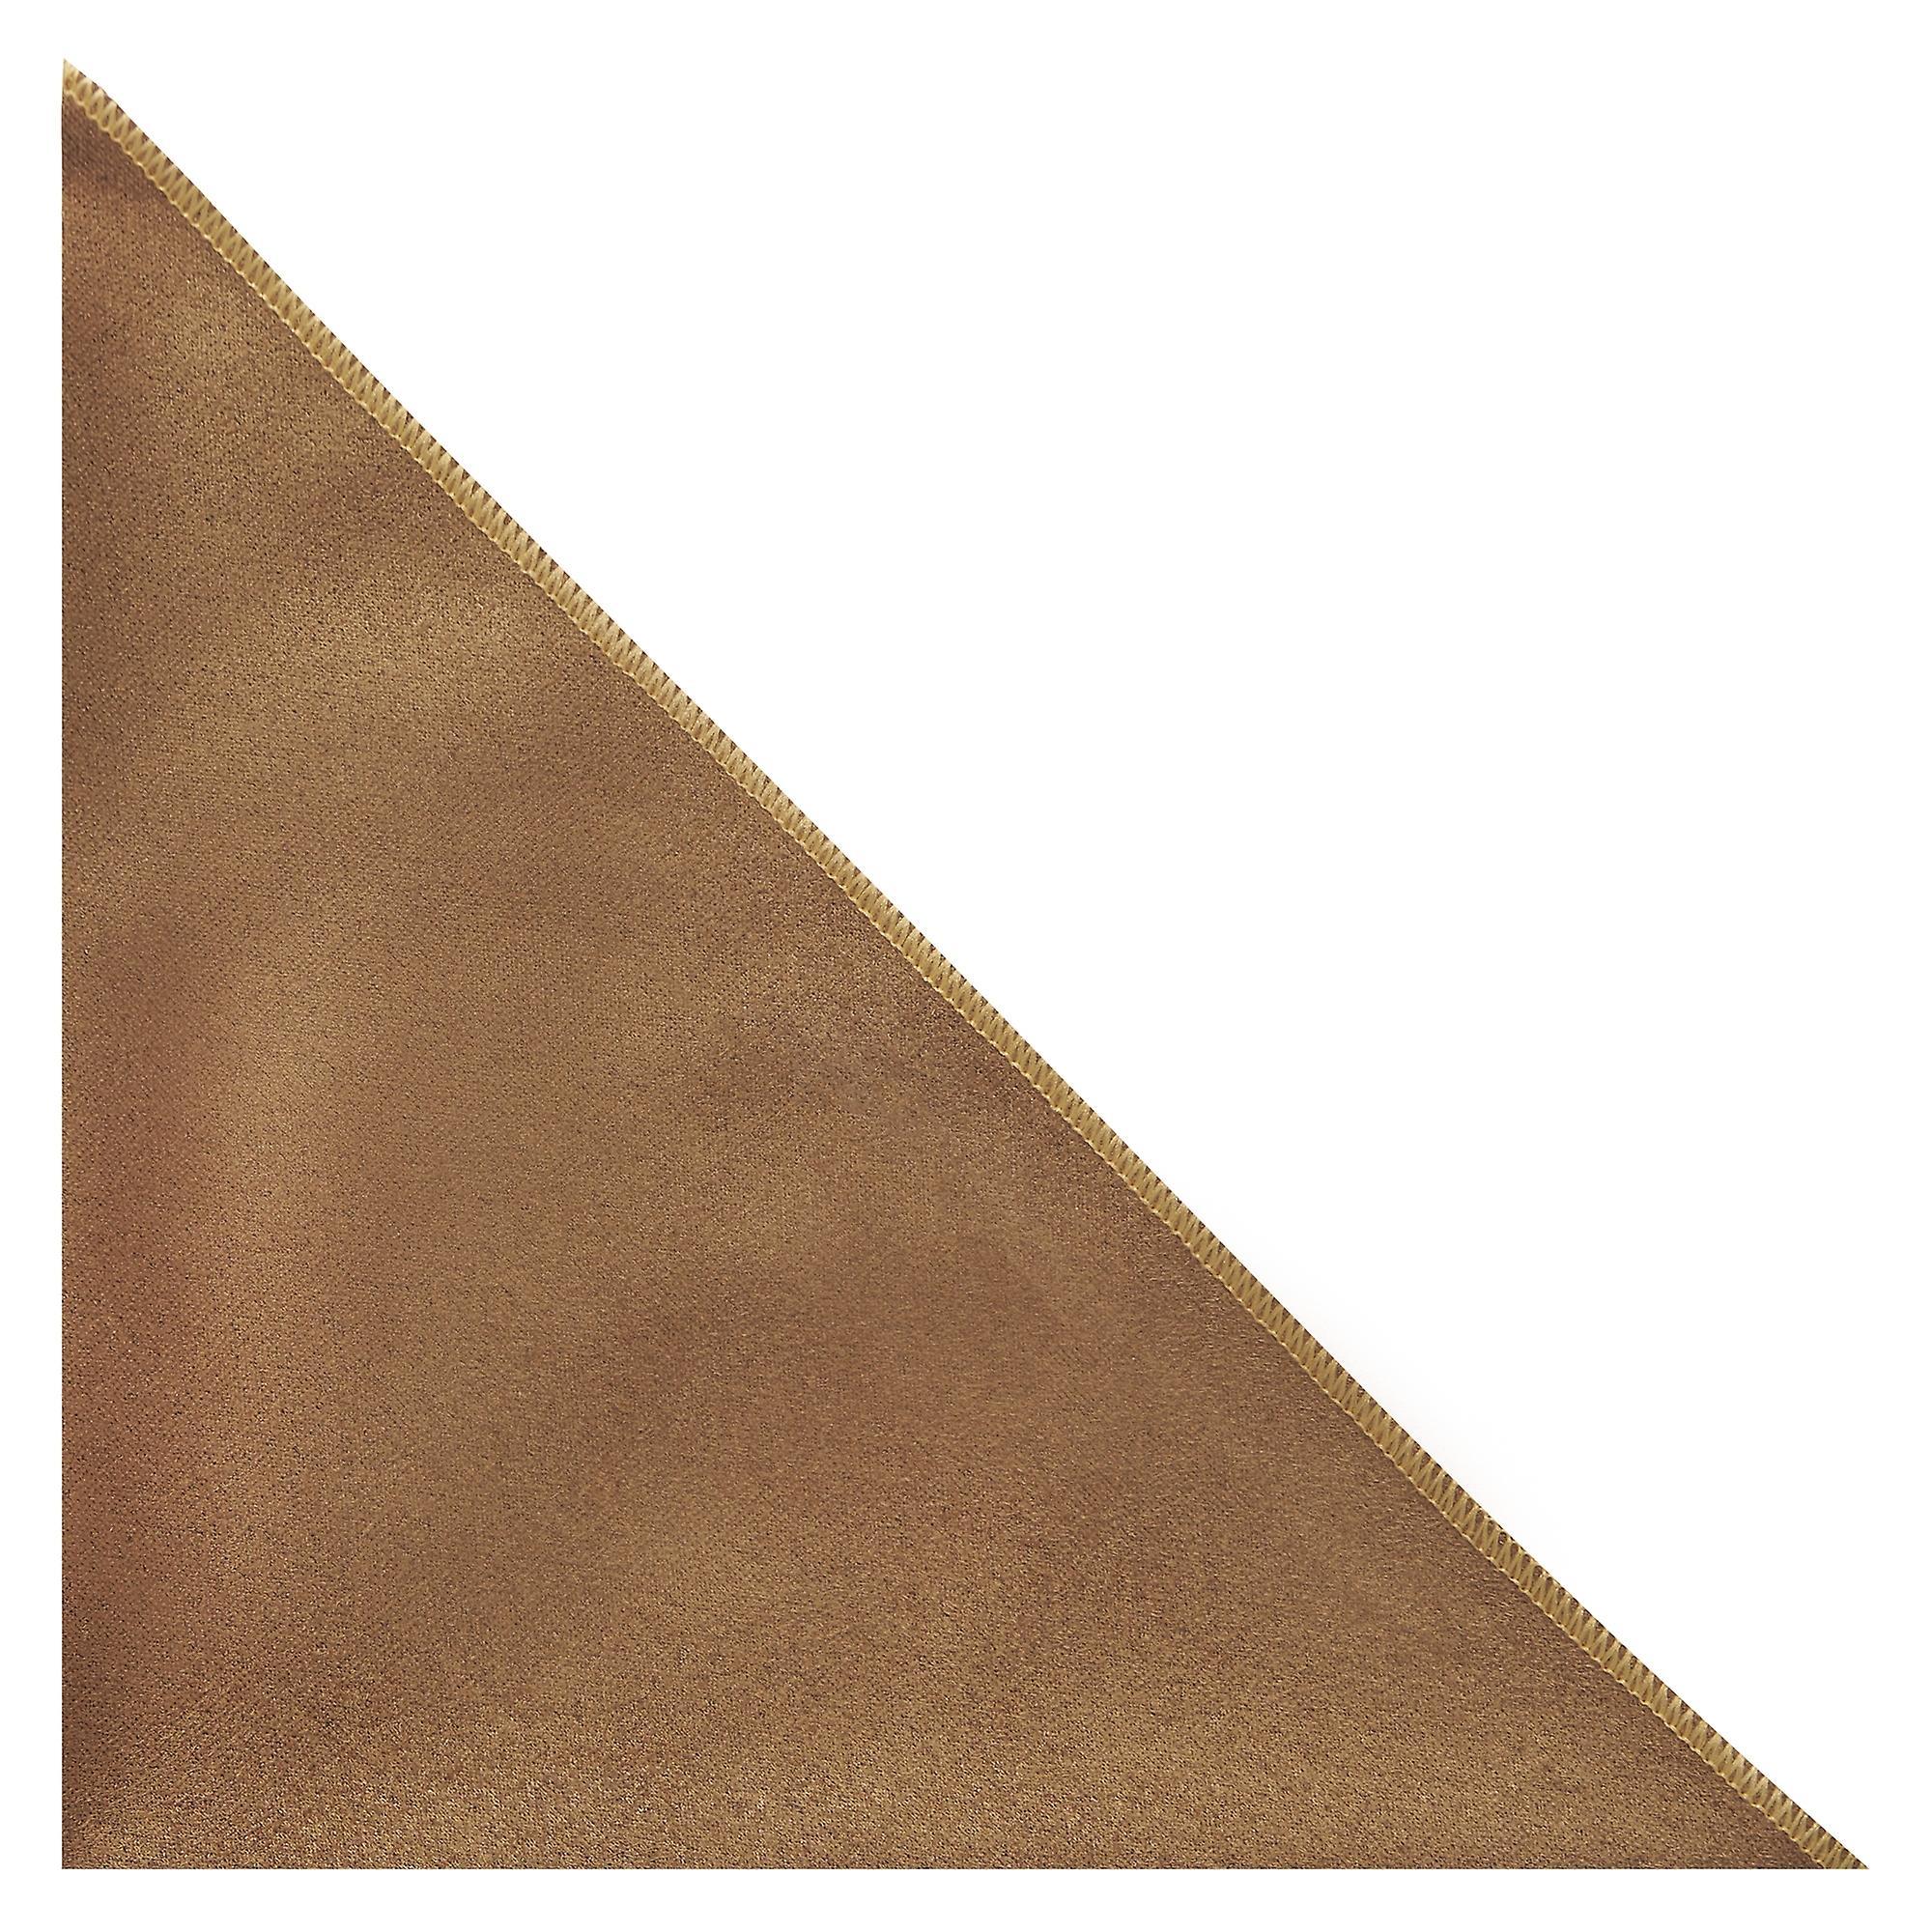 Luxury Golden Brown Suede Pocket Square, Handkerchief